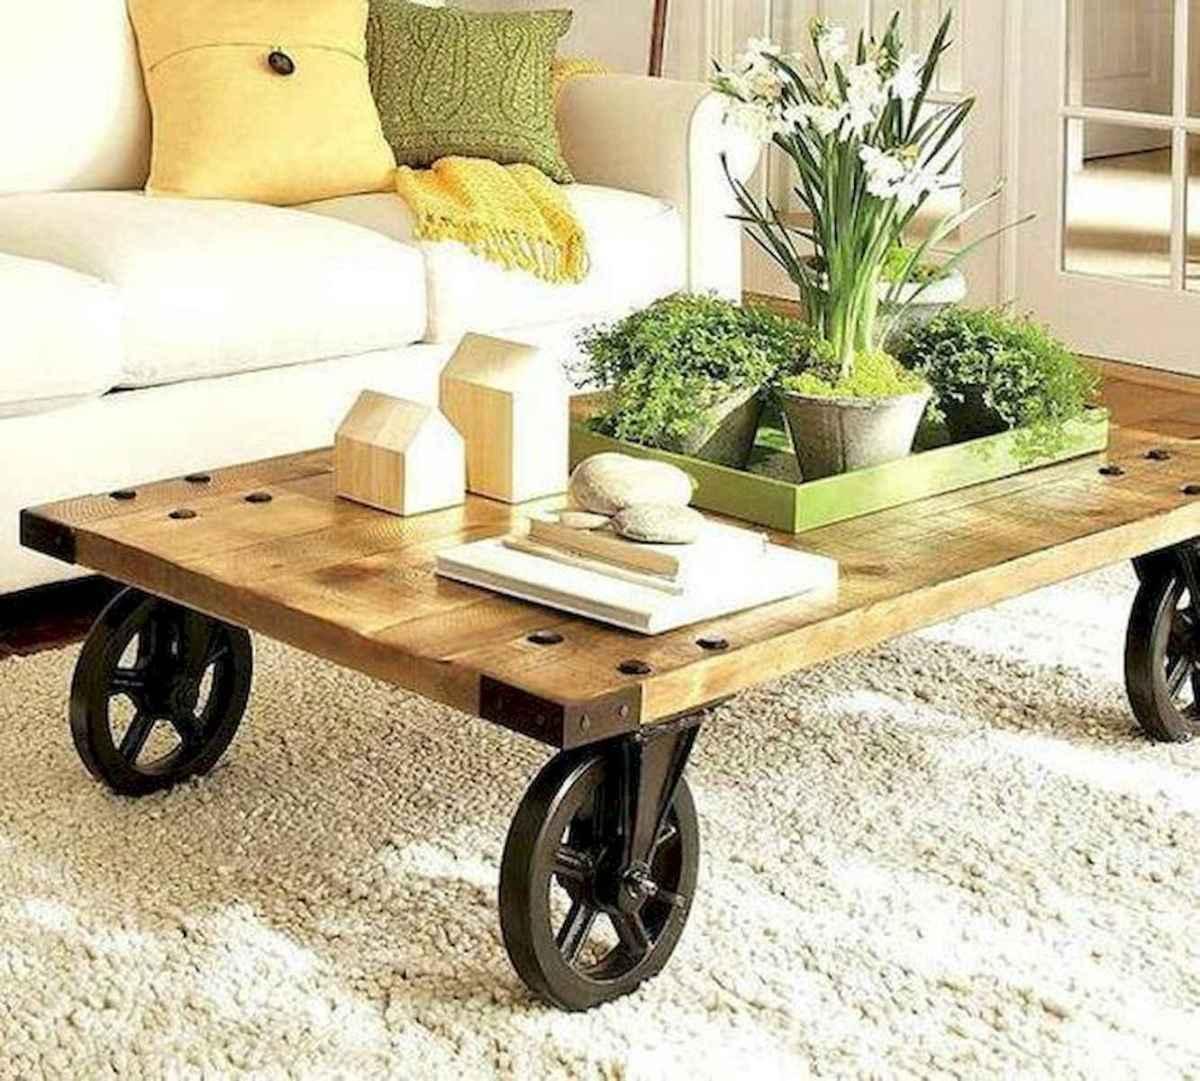 60 Fantastic DIY Projects Wood Furniture Ideas (60)